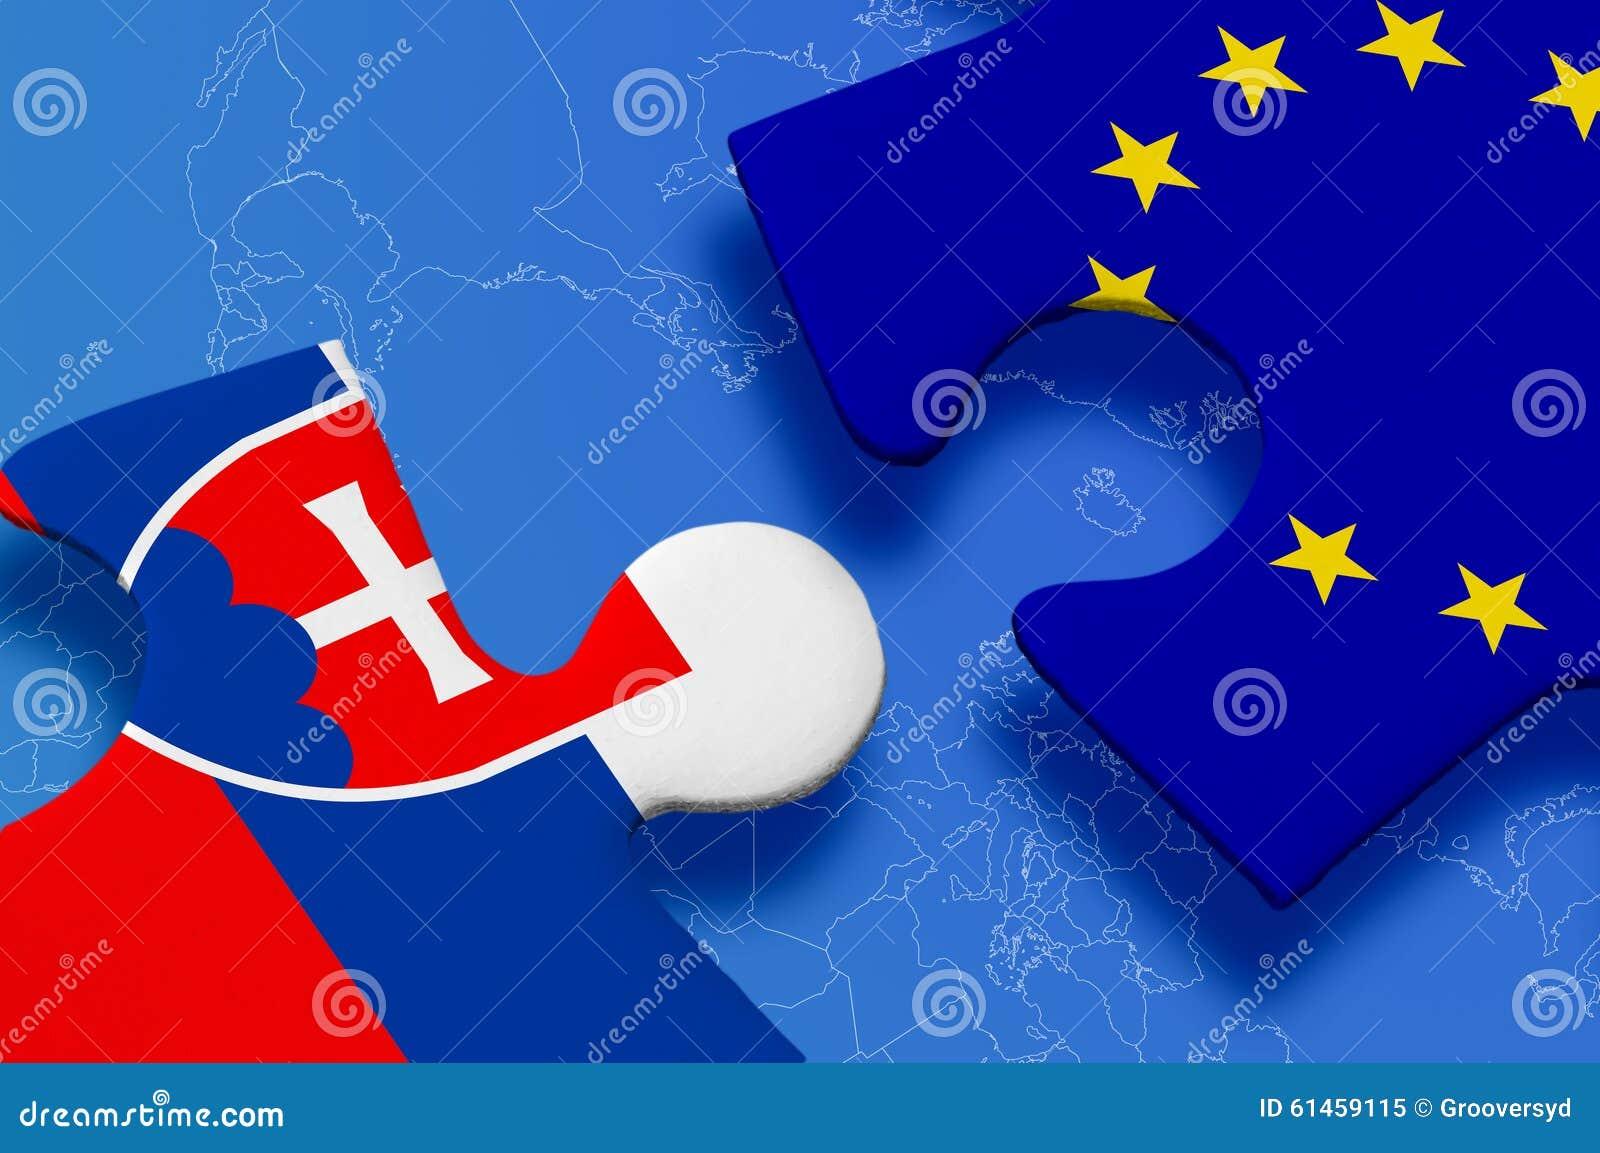 c3269a1a71 Slovakia European Union Puzzle Stock Illustration - Illustration of ...